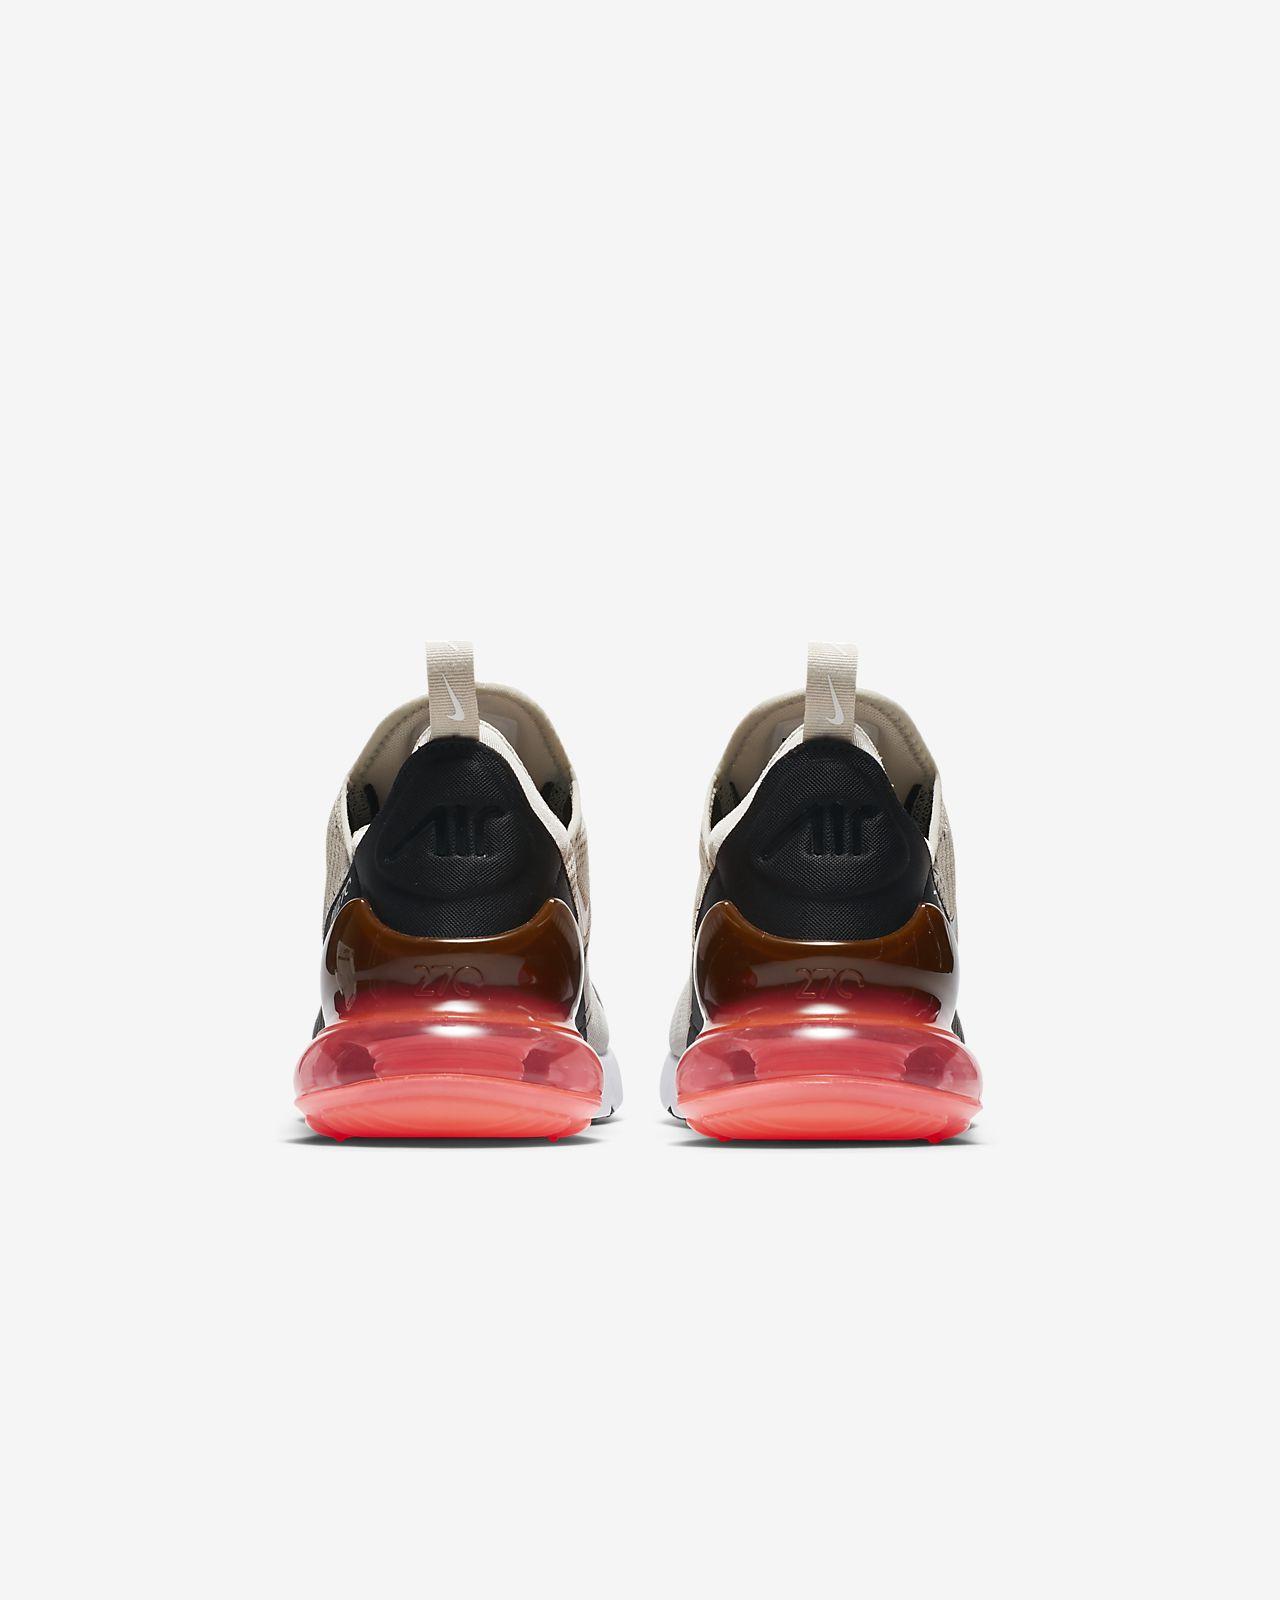 Air Max Nike Hombre Zapatillas 270 yvOP8mNn0w